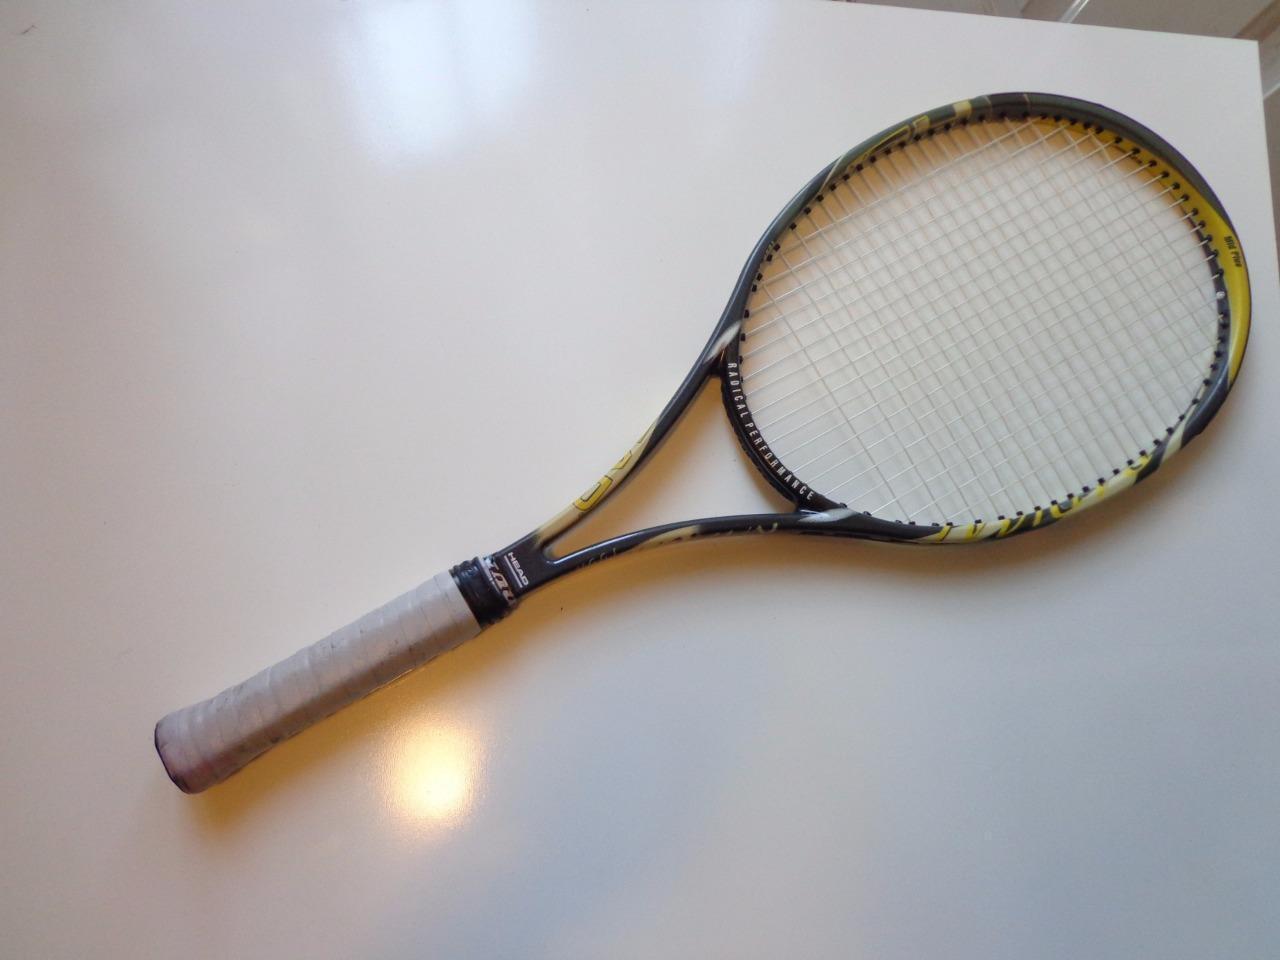 Cabeza rara radical Tour Cebra Hecho En Austria 98 cabeza 4 1 4 Grip Tenis Raqueta